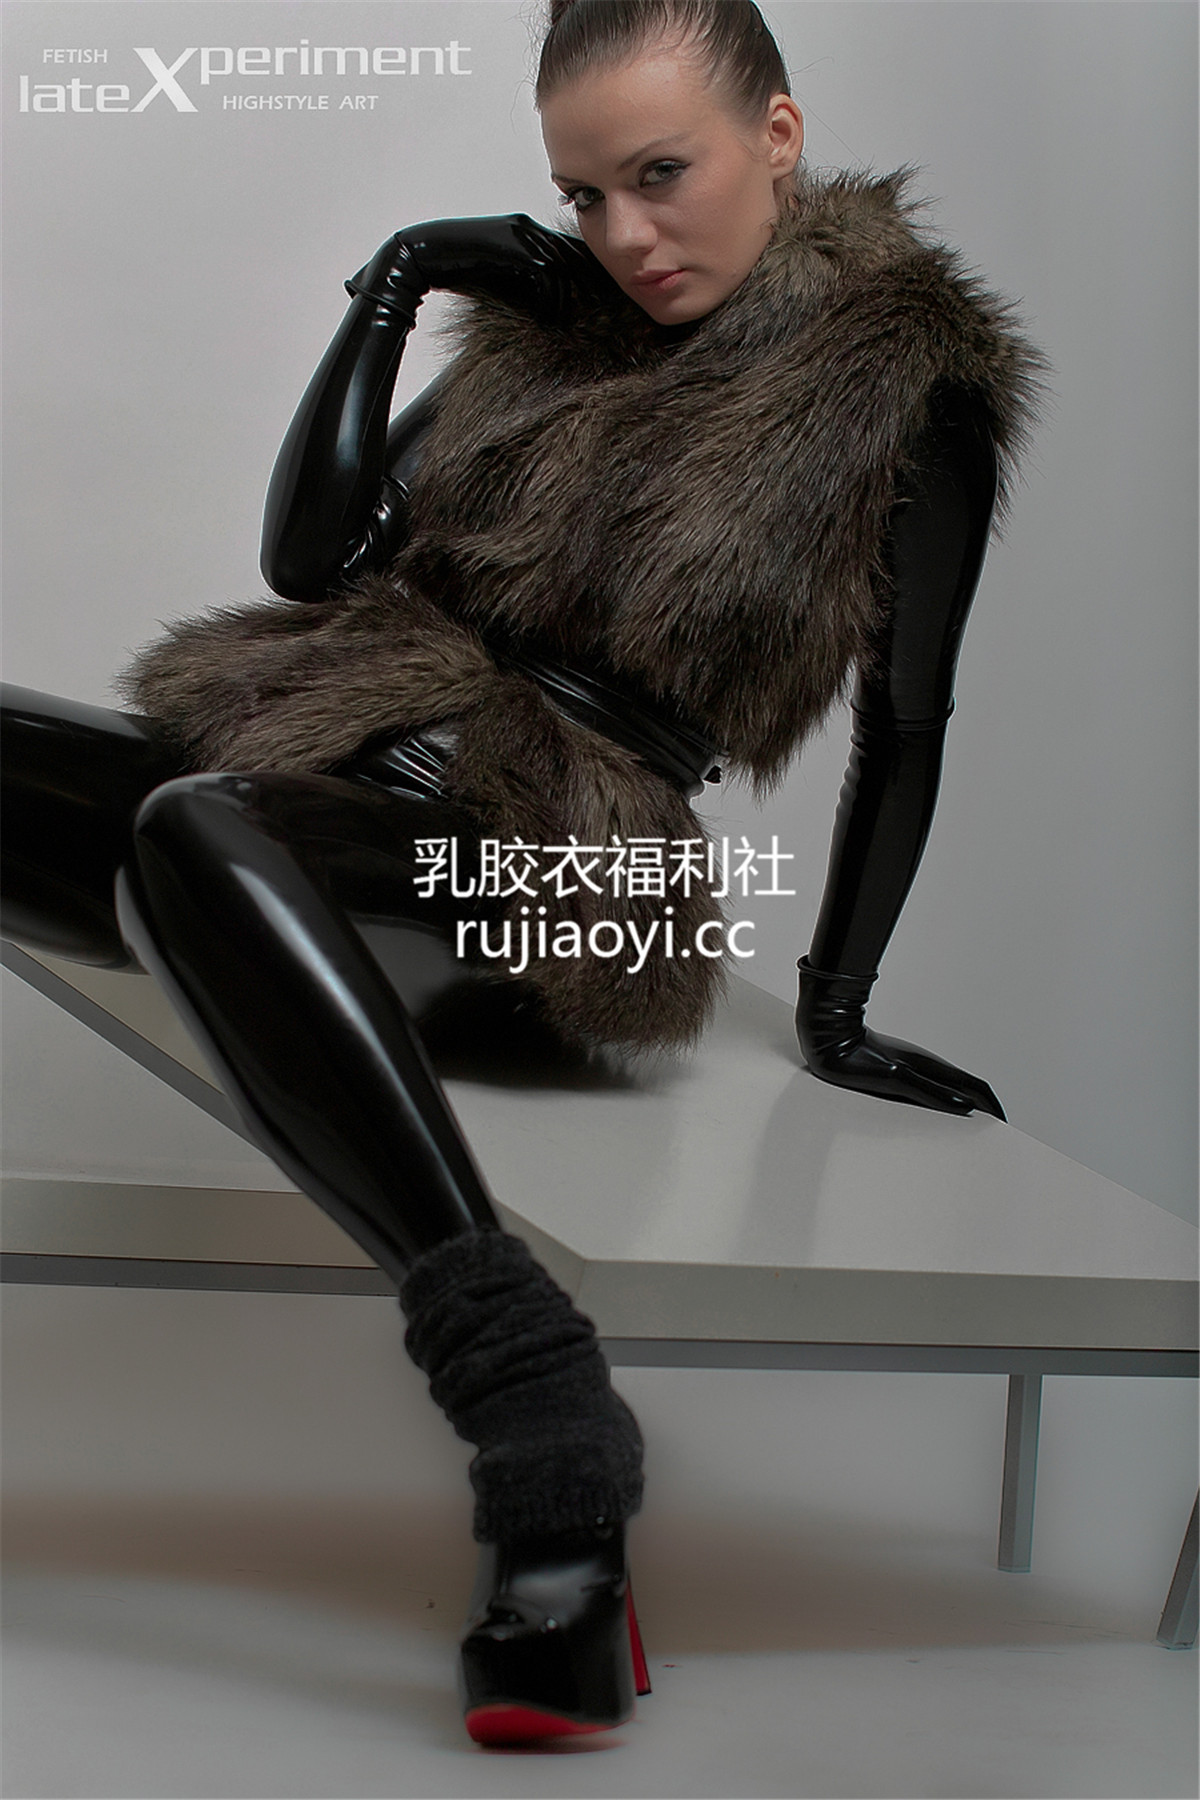 [LateXperiment] 气质美女黑色乳胶衣手套诱惑写真